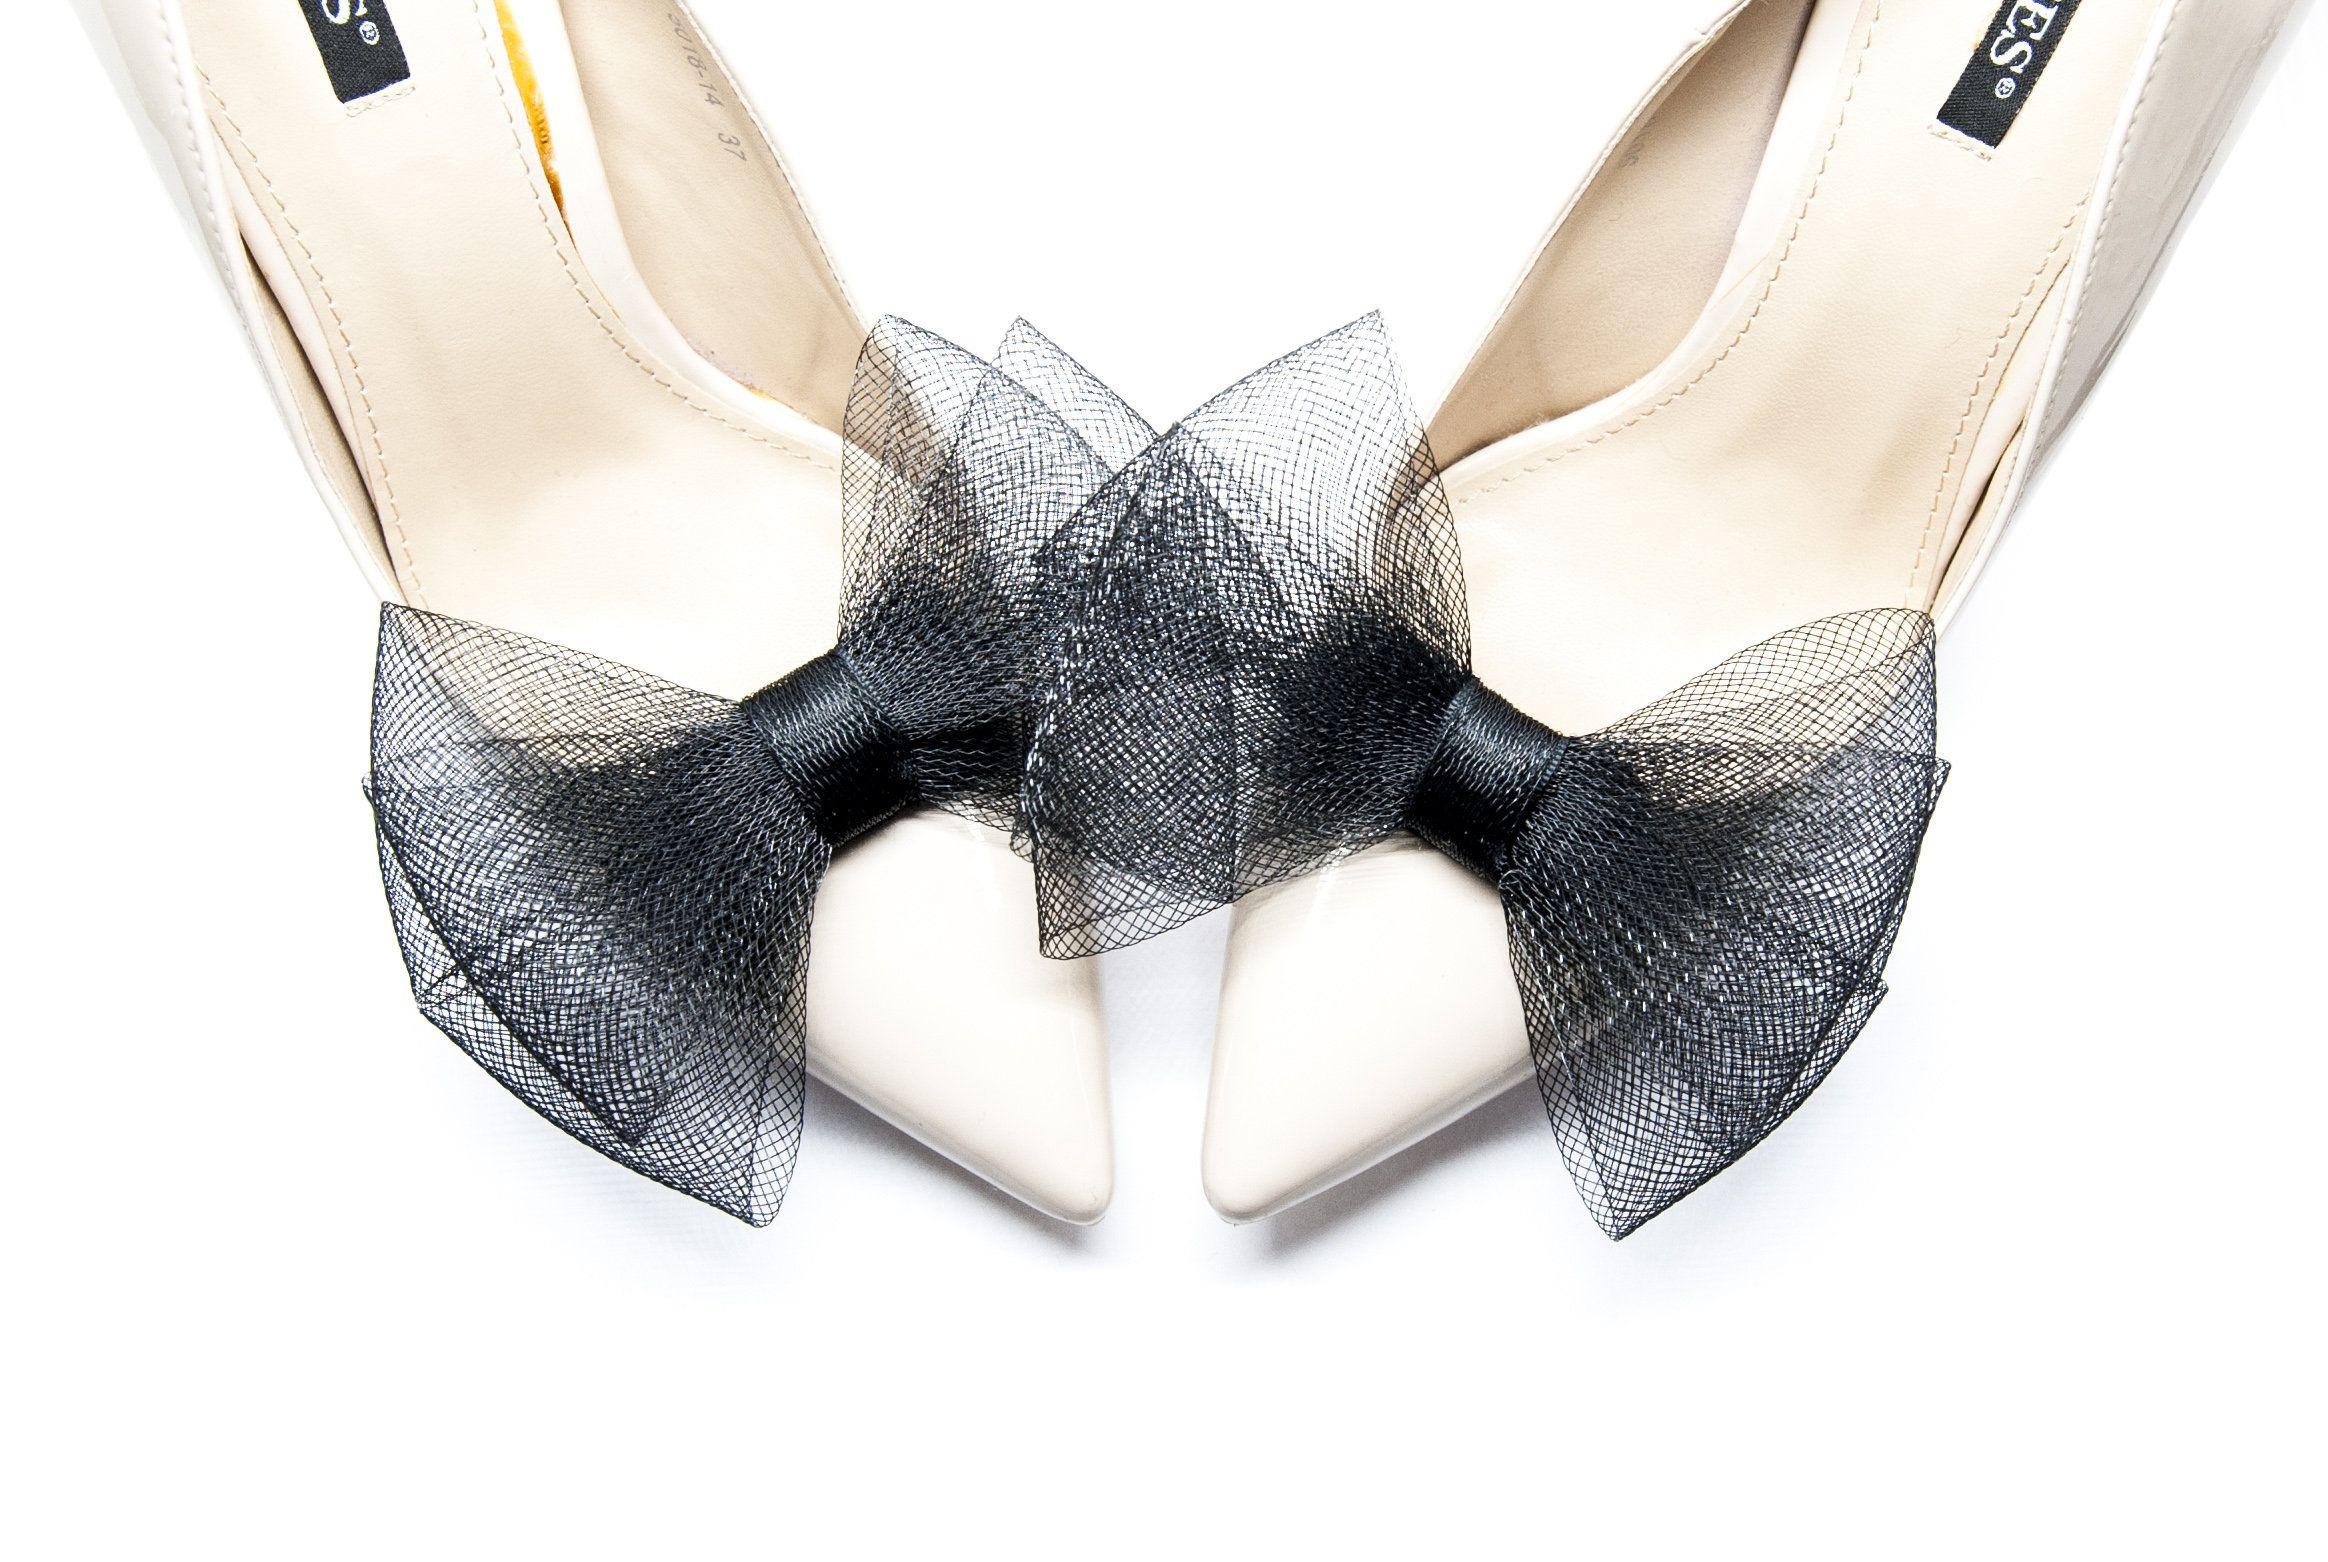 Czarne Kokardy Z Krynoliny Klipsy Do Butow Mififi Etsy Shoe Clips Bow Shoes Bridal Shoes